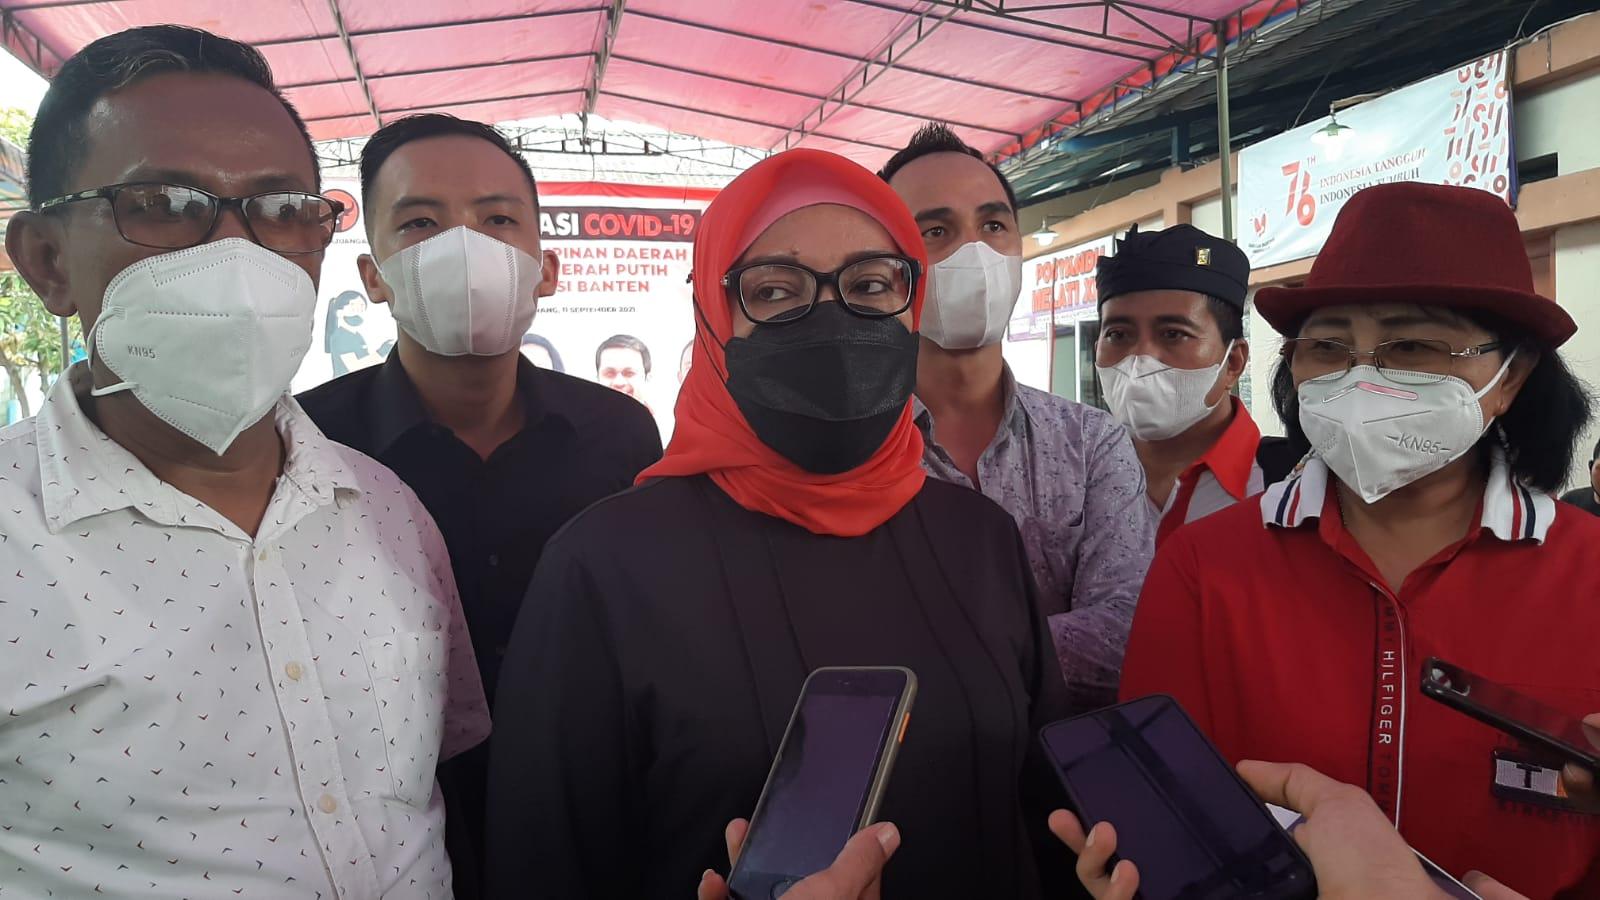 Anggota DPRD Kabupaten Tangerang Lisiawati Lase saat meninjau peserta yang disuntik vaksin Sinovac dosis kedua di Kelurahan Kutajaya, Kecamatan Pasar Kemis, Kabupaten Tangerang, Sabtu 11 September 2021.